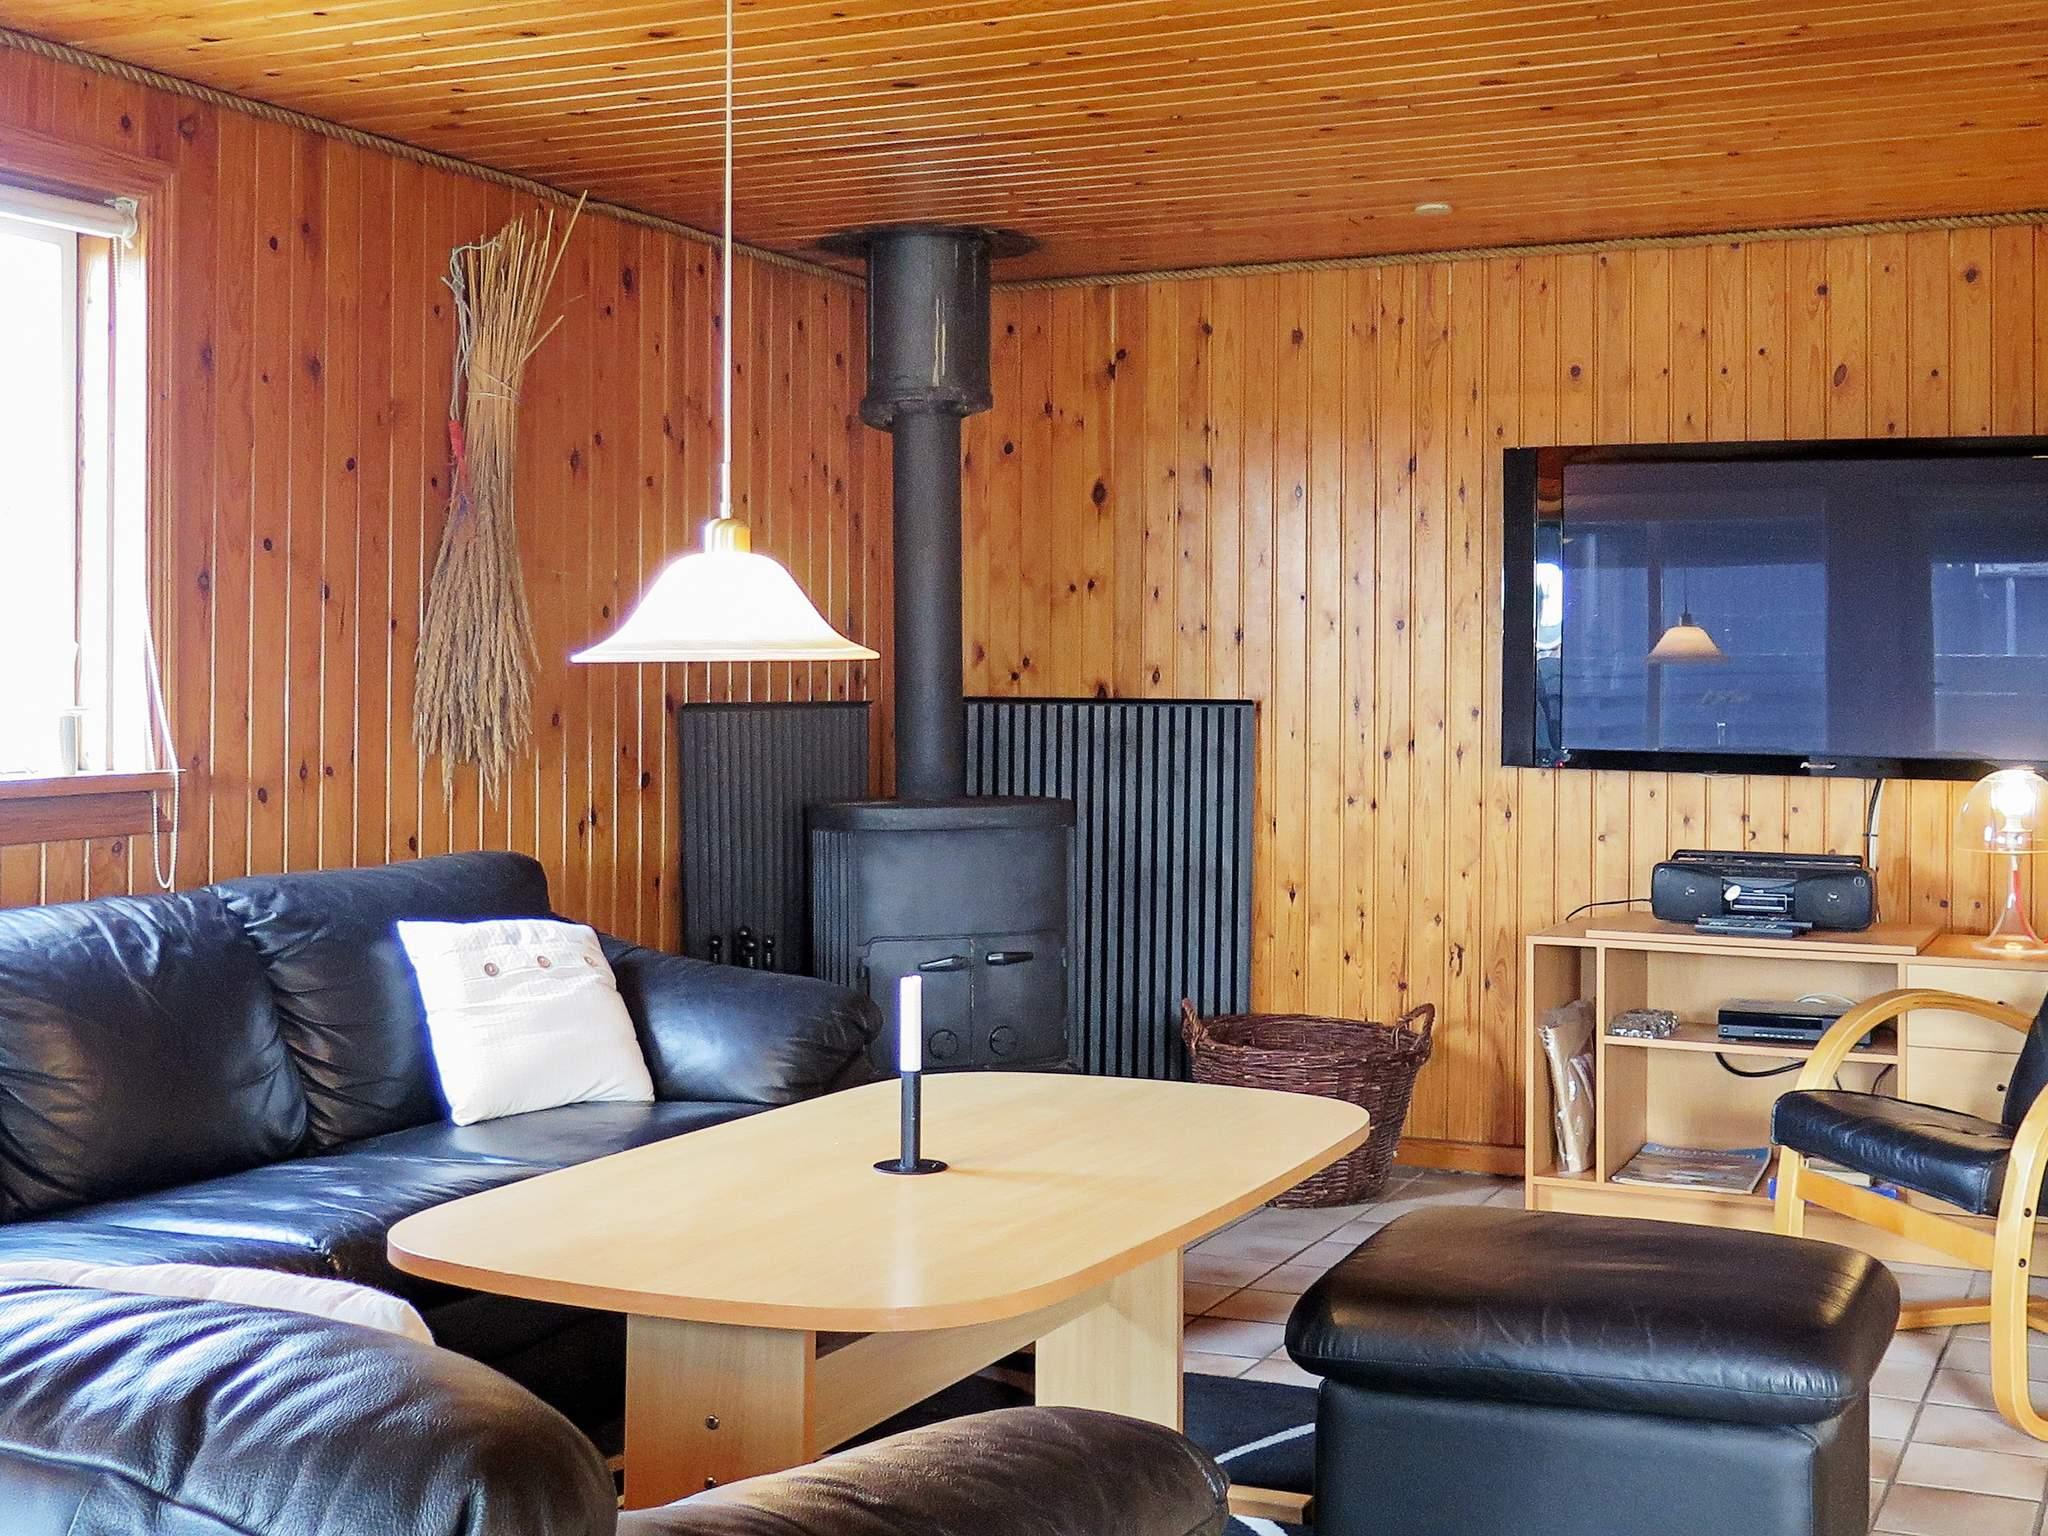 Ferienhaus Vrist (83580), Vrist, , Limfjord, Dänemark, Bild 2